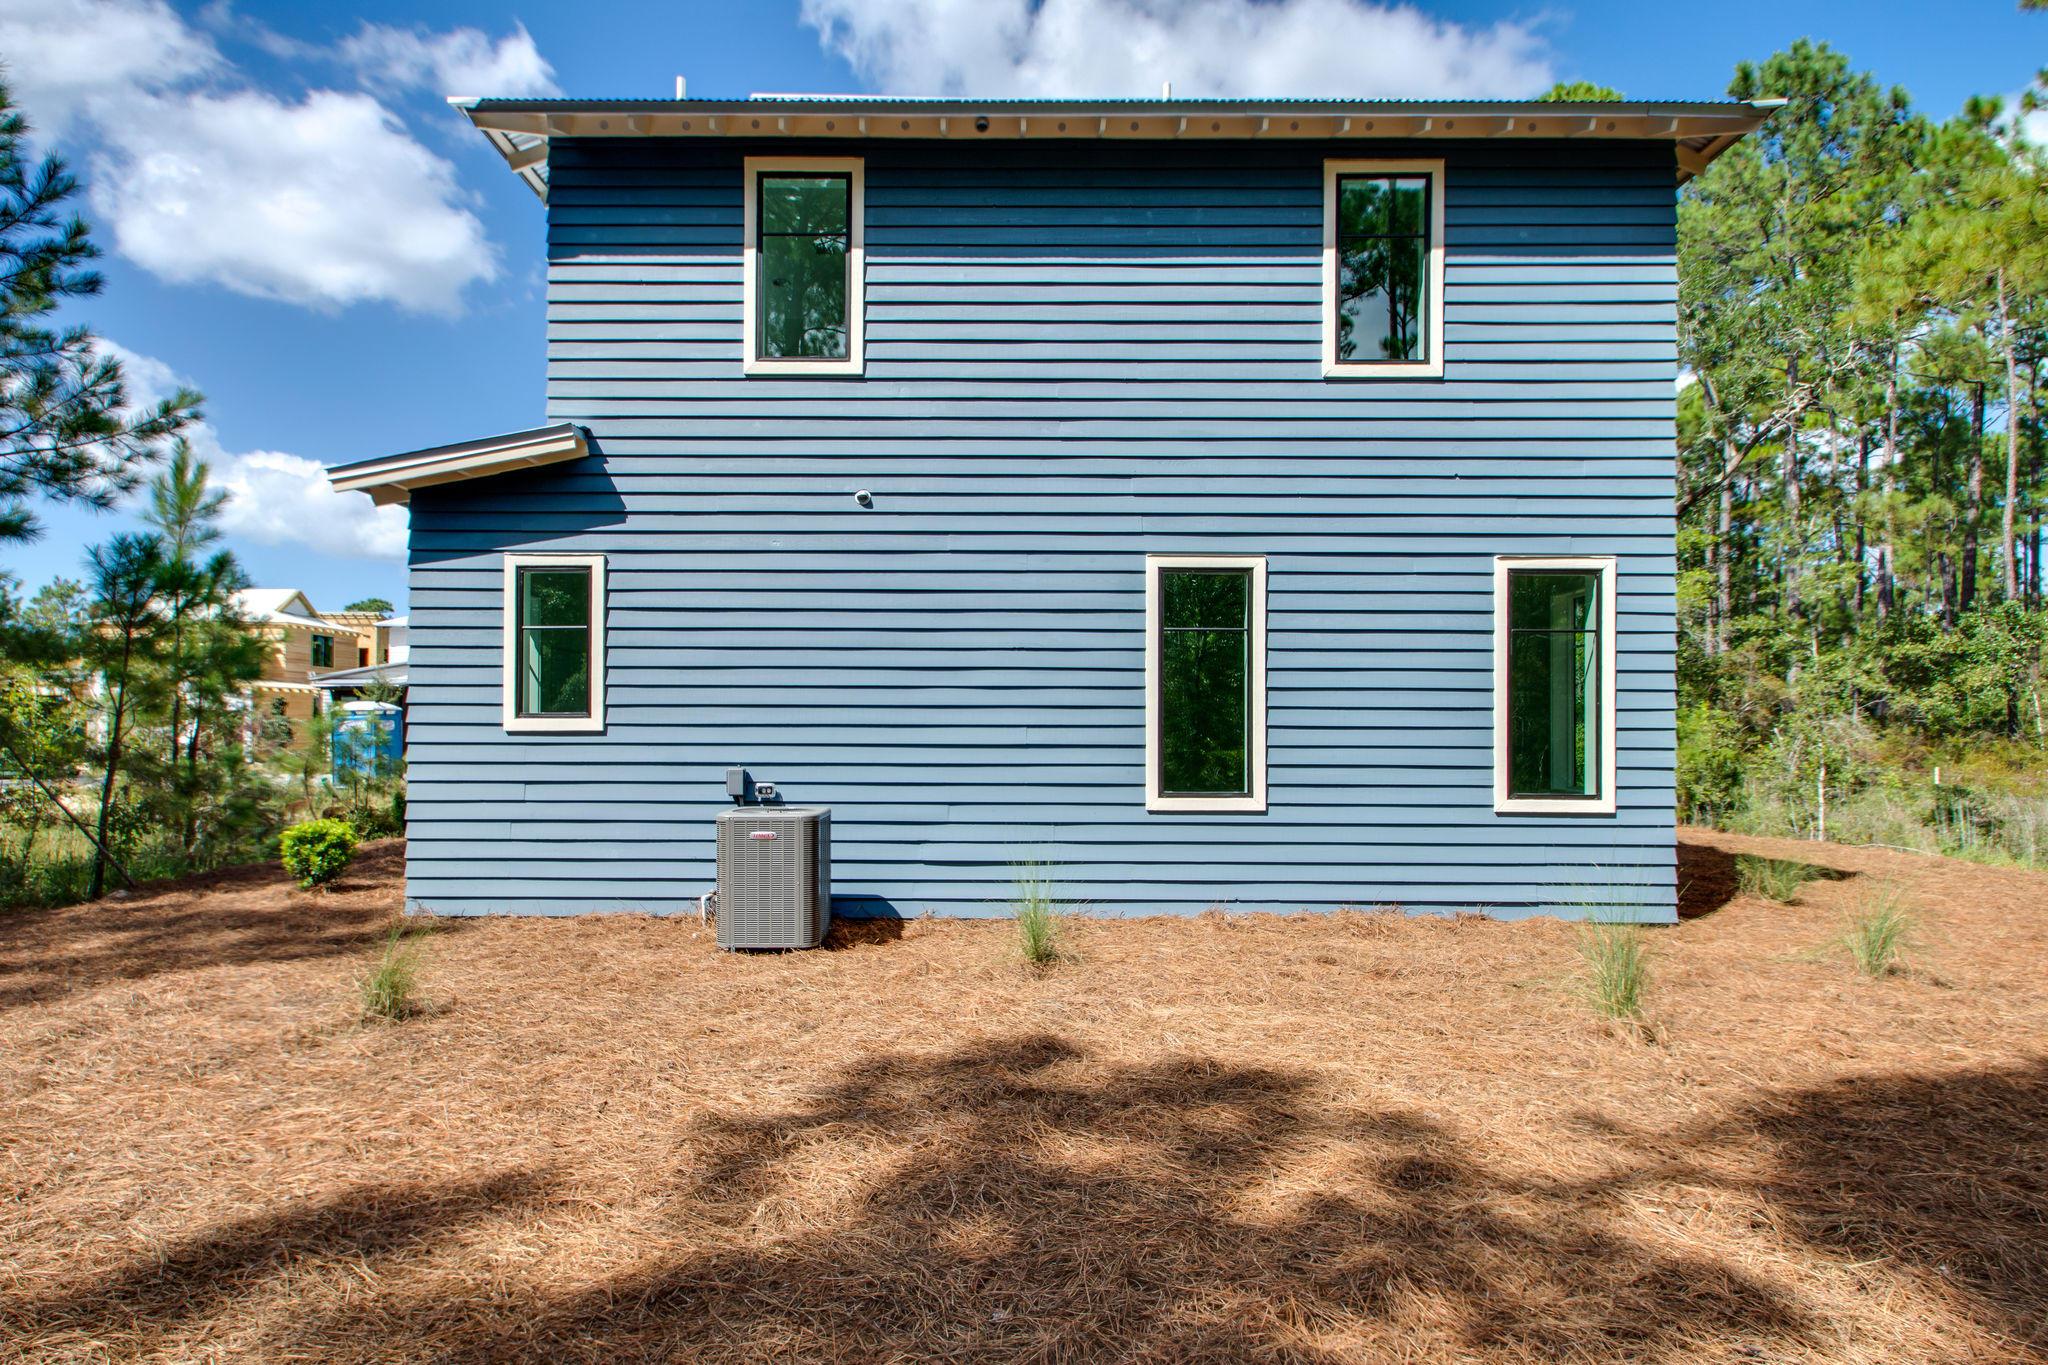 Photo of home for sale at Lot E-3 Eden Landing, Santa Rosa Beach FL